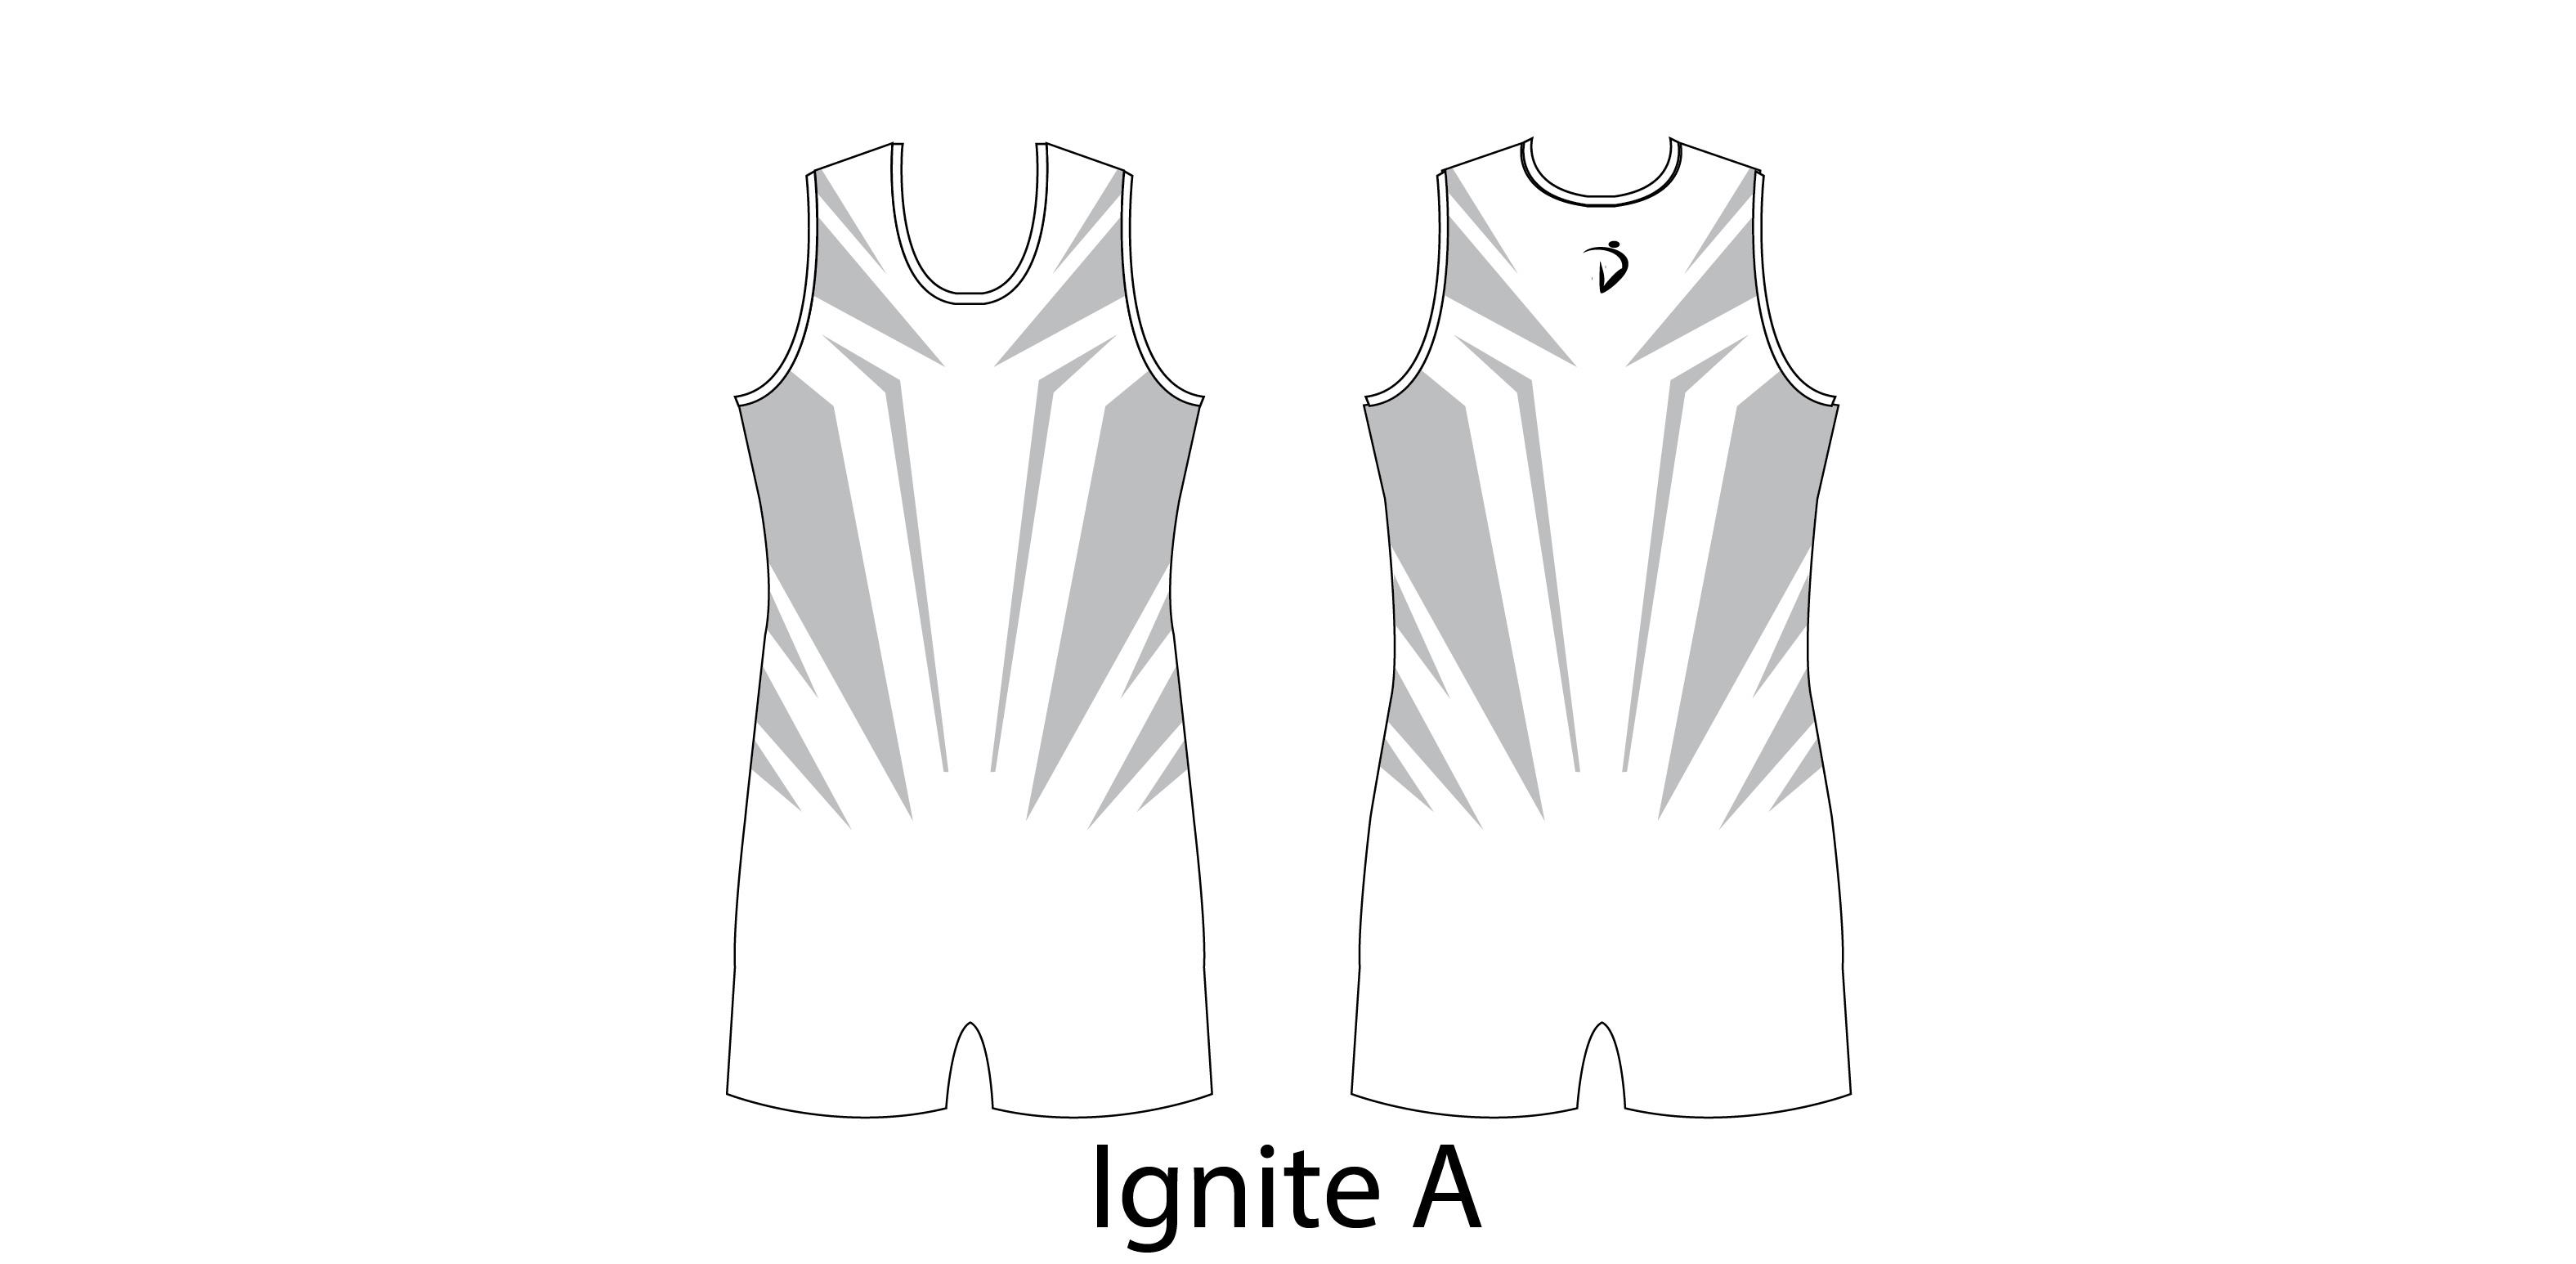 Ignite A